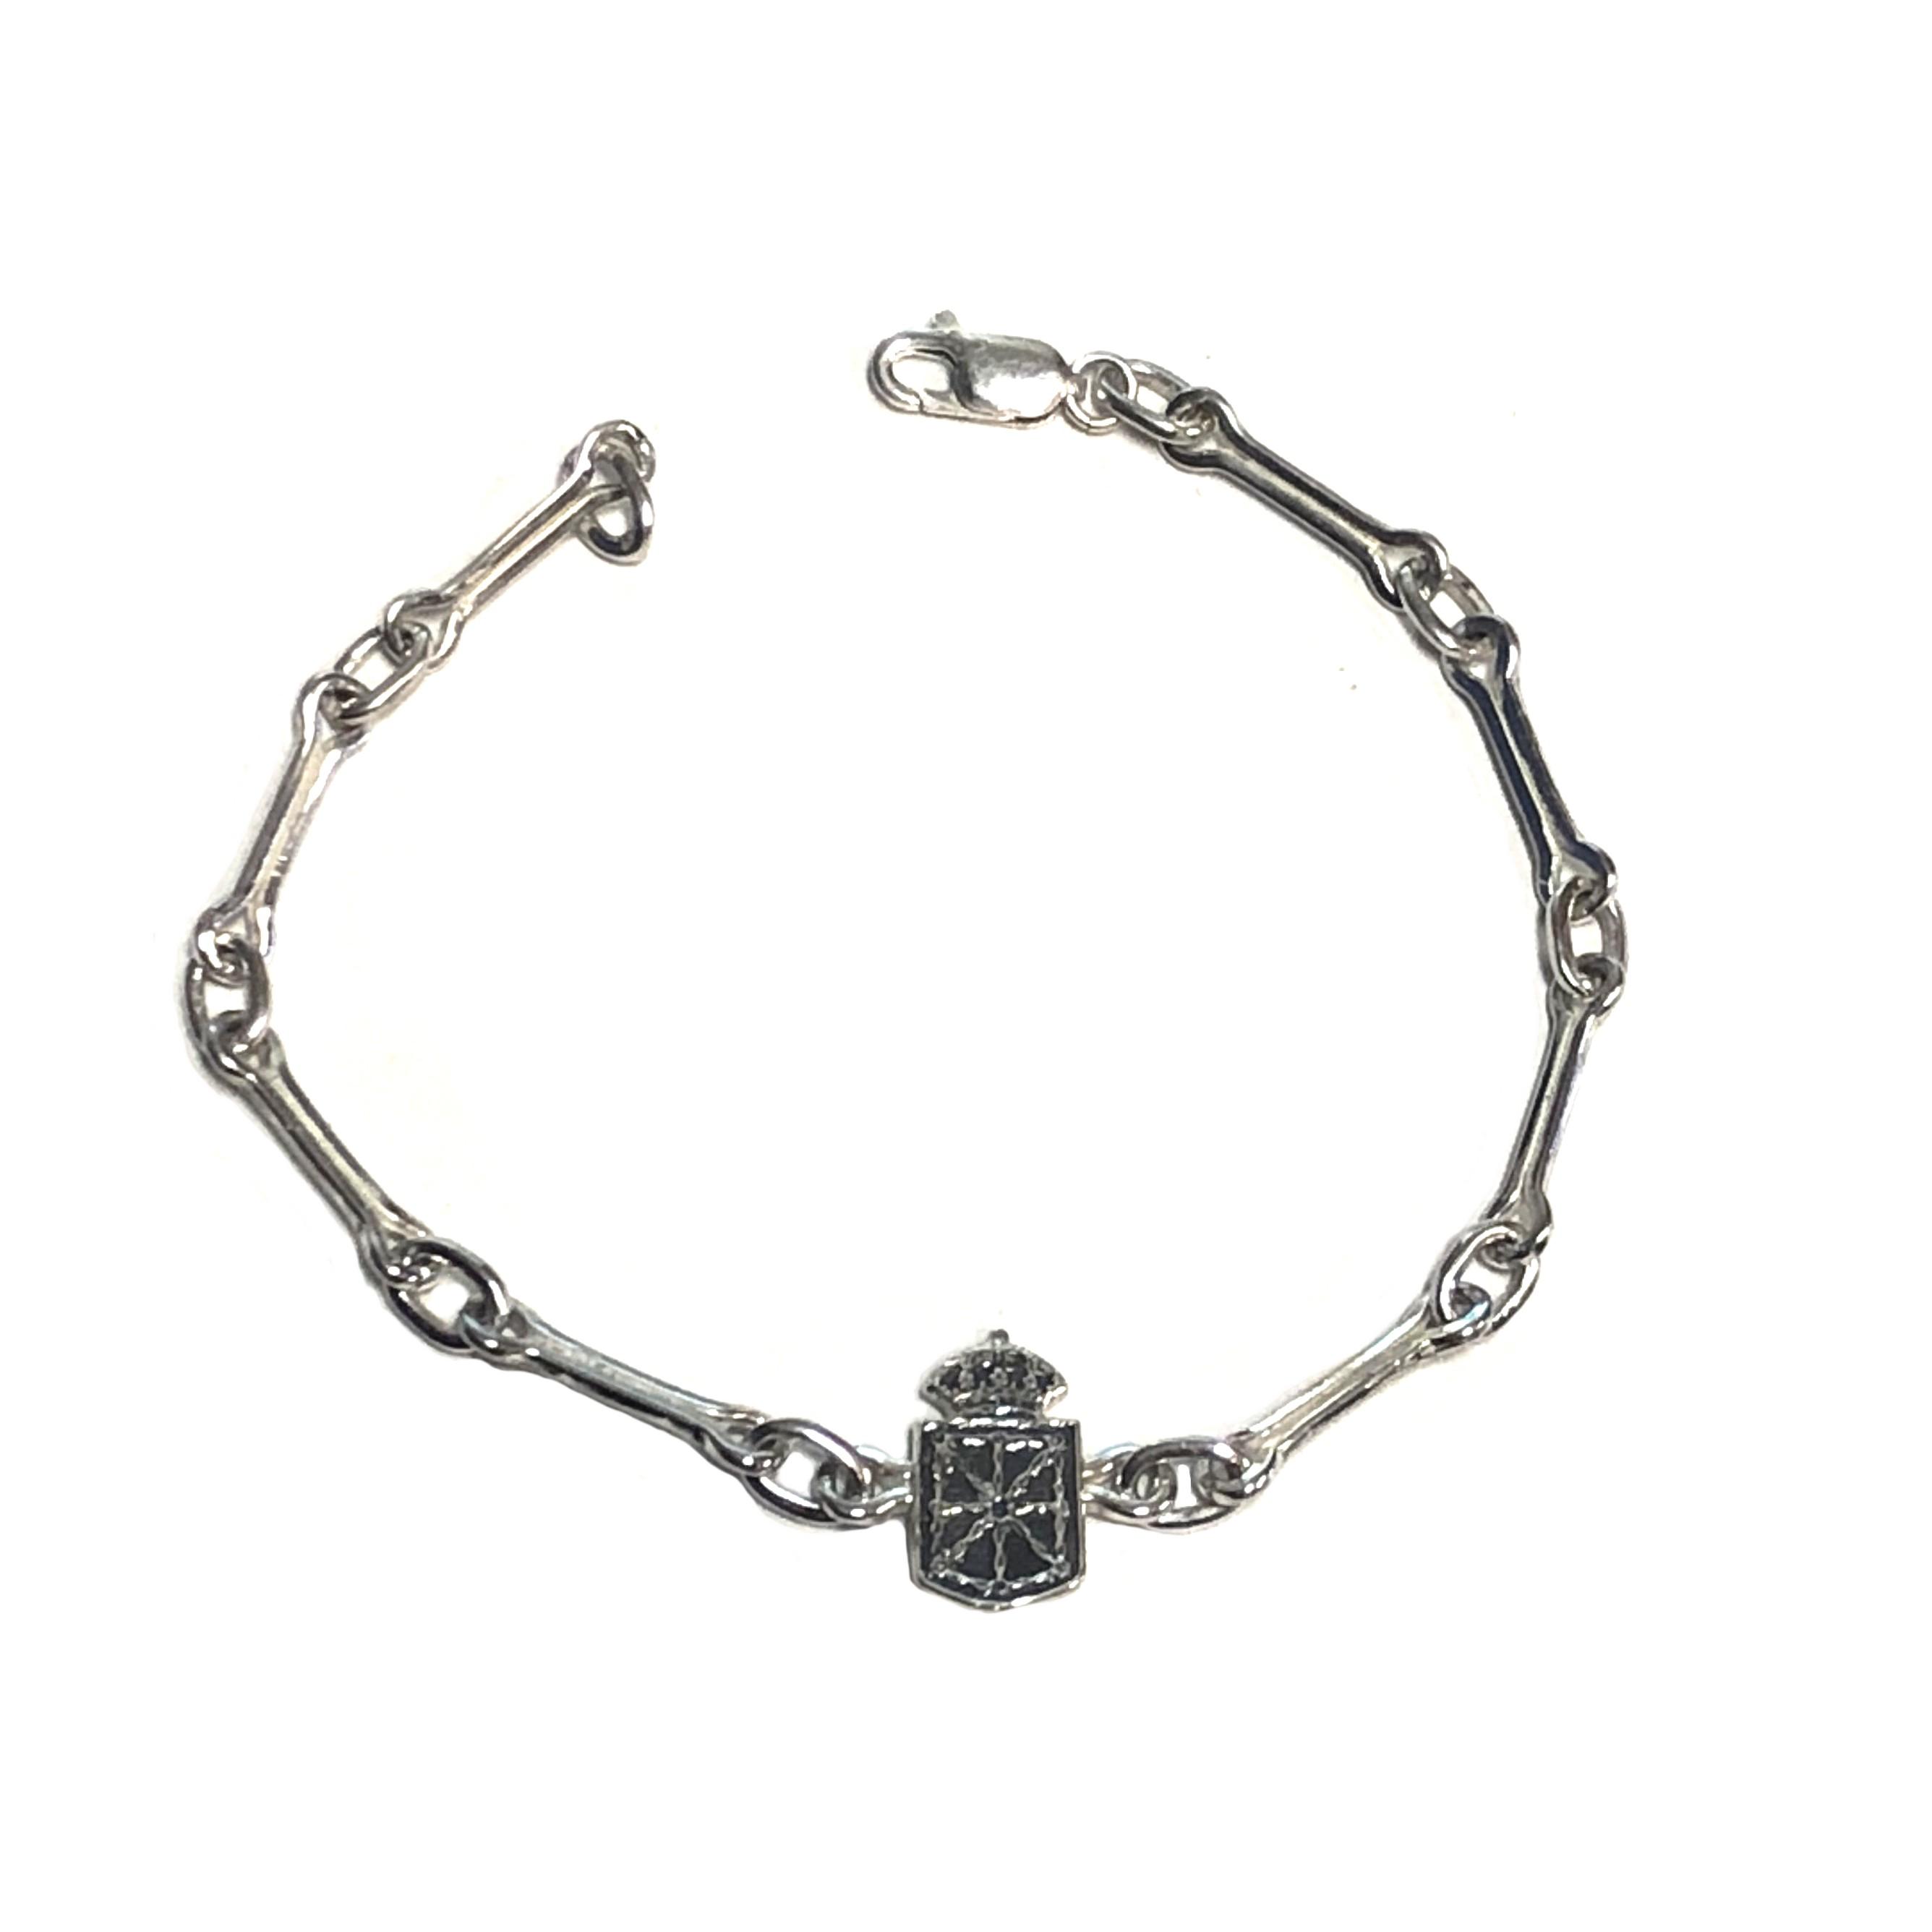 c097c4b1a287 pulsera de plata cadenas de navarra con escudo de navarra joyería juan luis  larráyoz pamplona